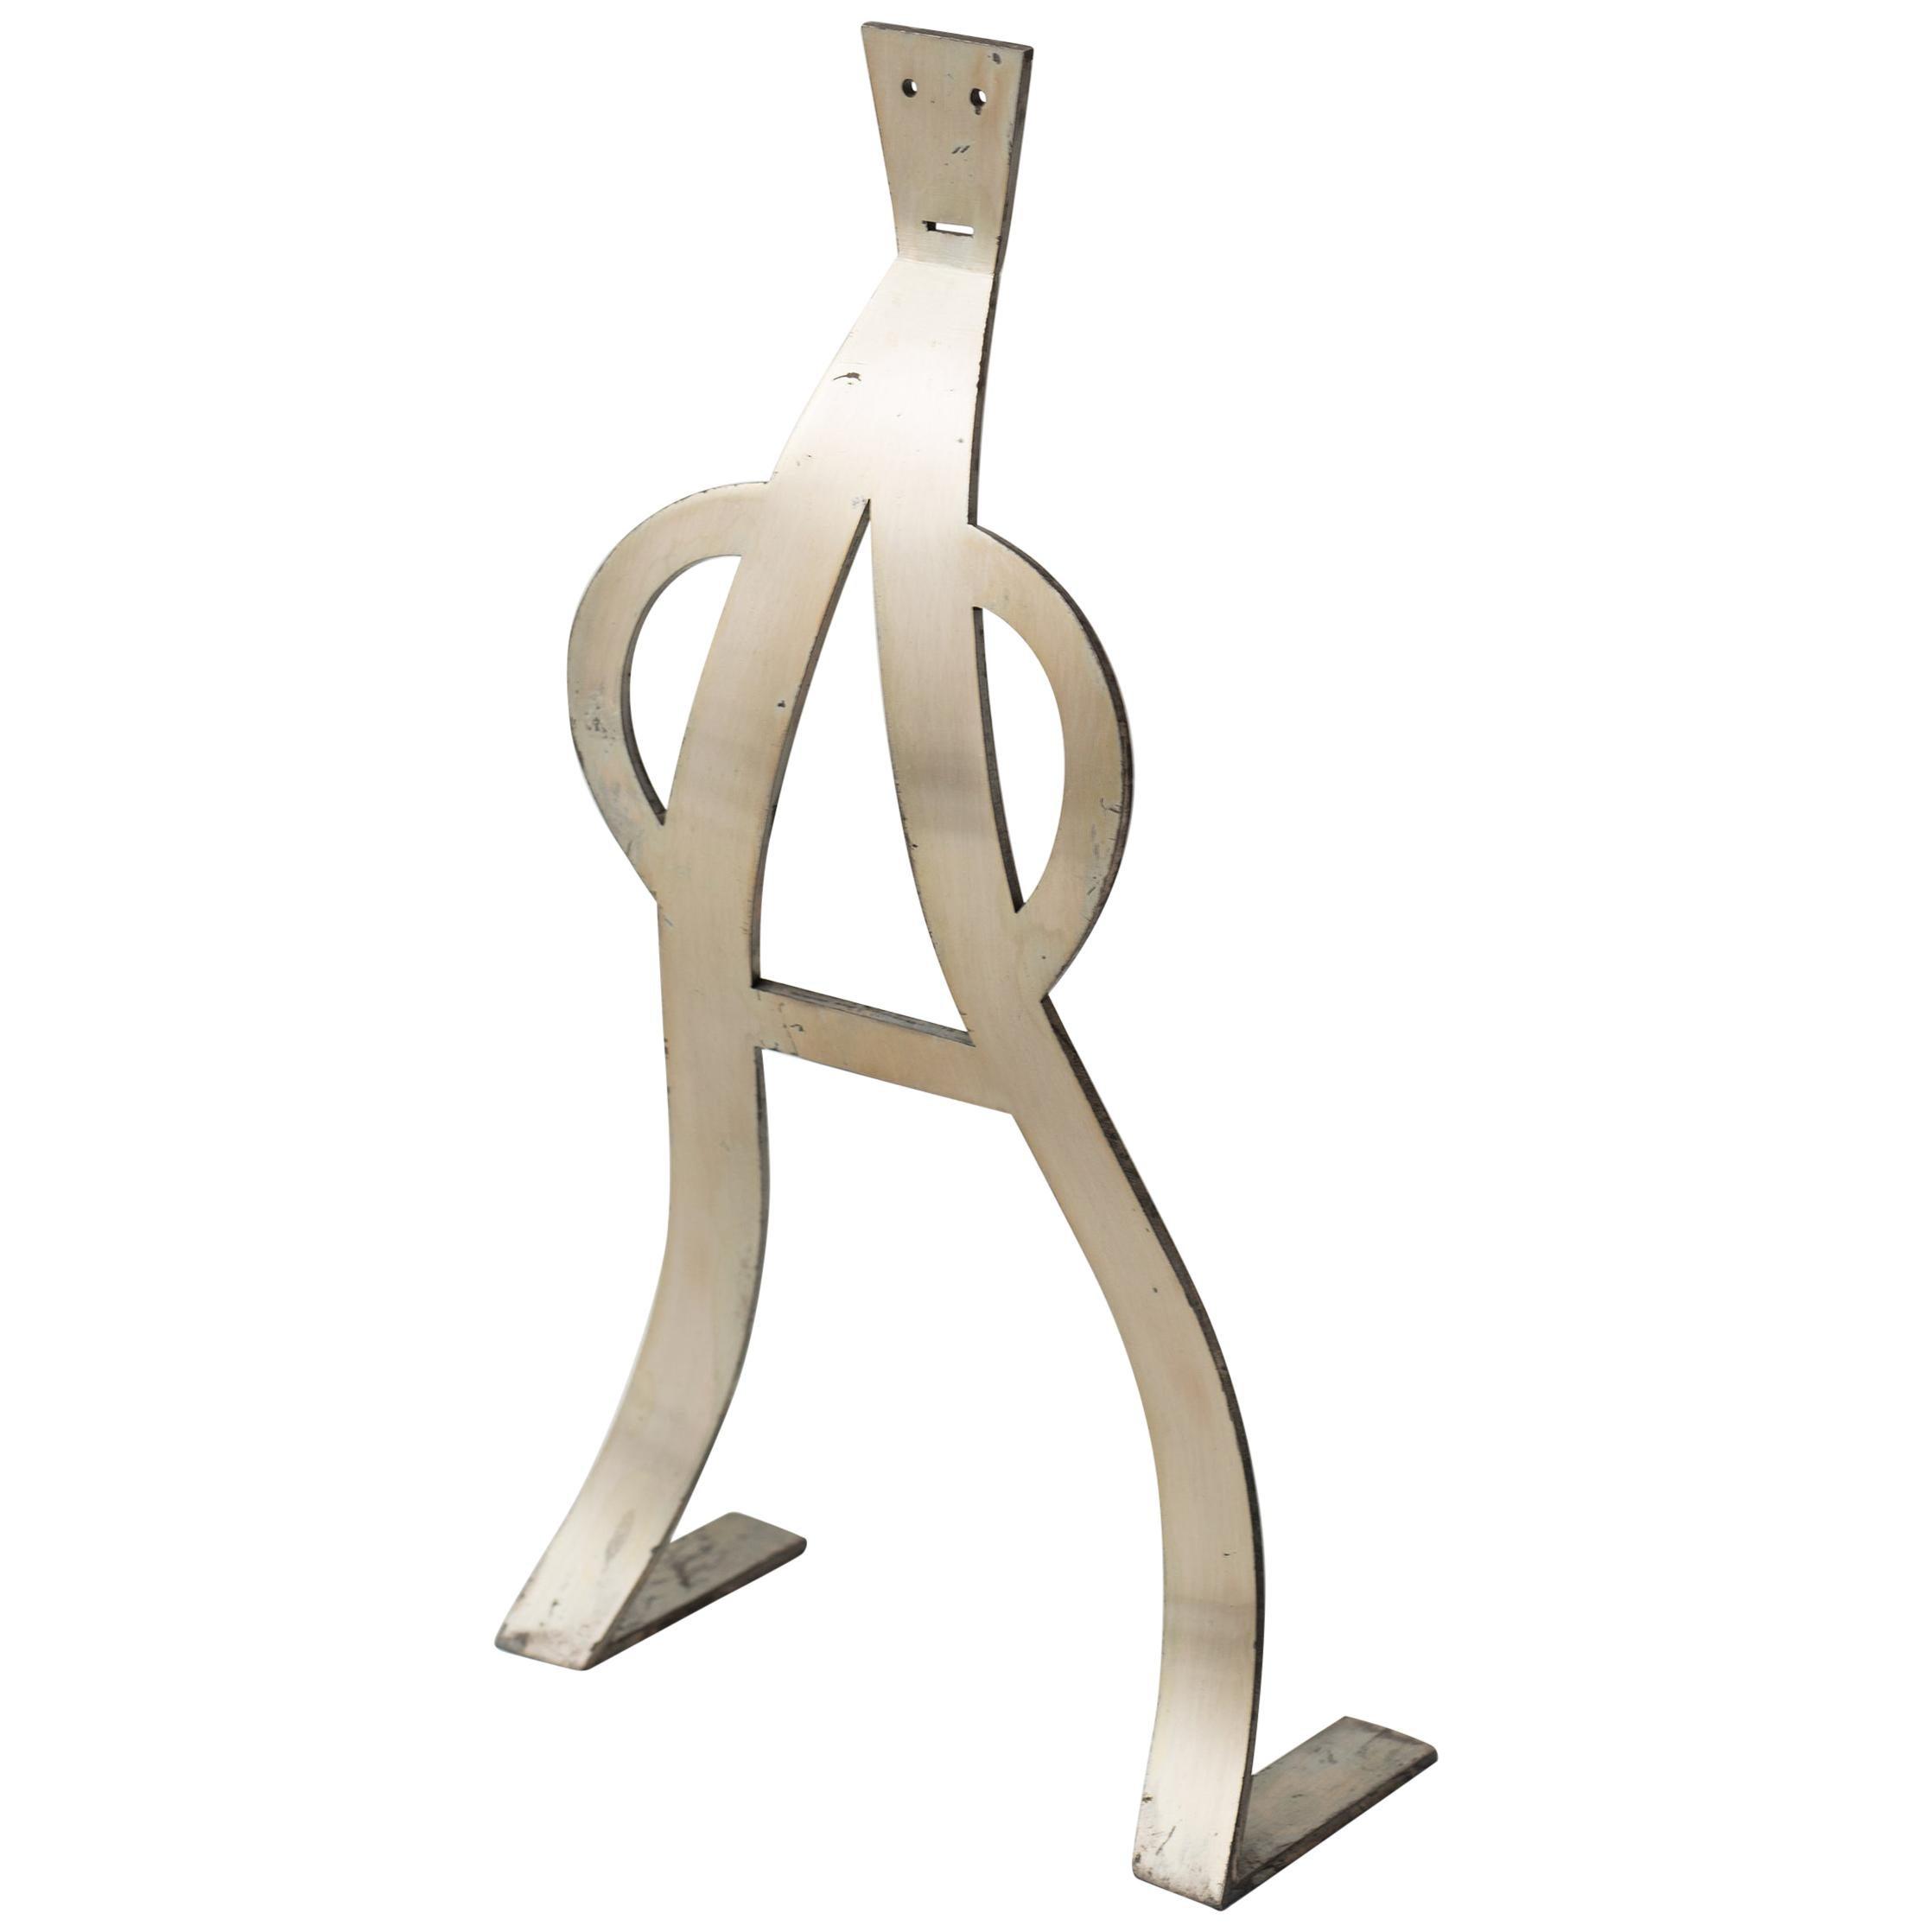 Alessandro Guerriero Lari Sculpture Autoritratto Tam Tam Limited Edition